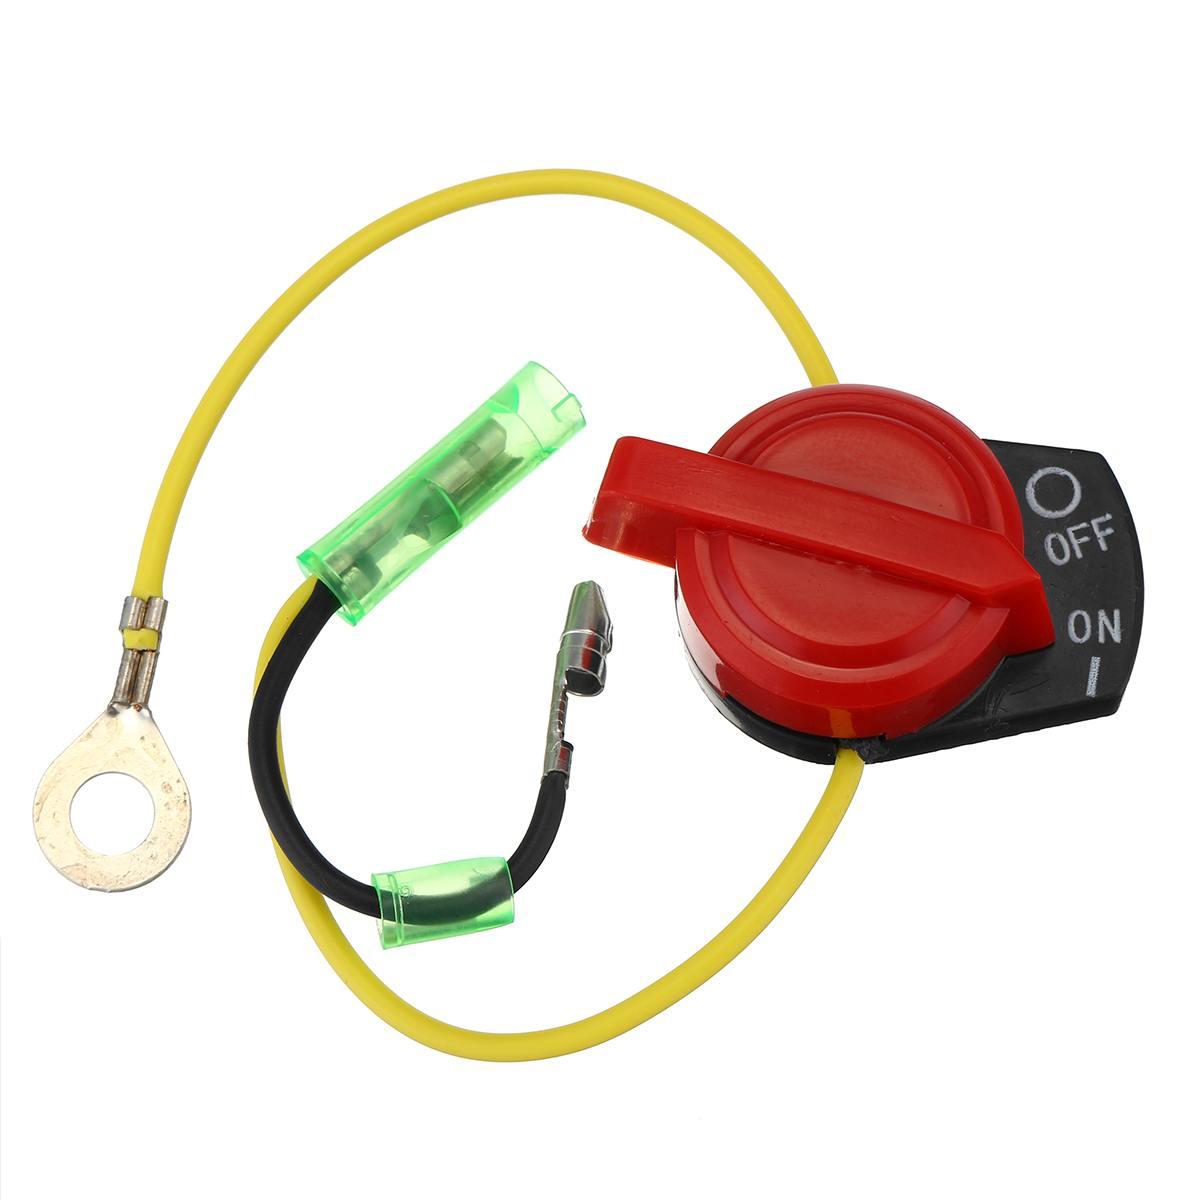 Poder de interruptor para Honda G100 GX100 GX110 GX120 GX160 GX200 GX240 GX270